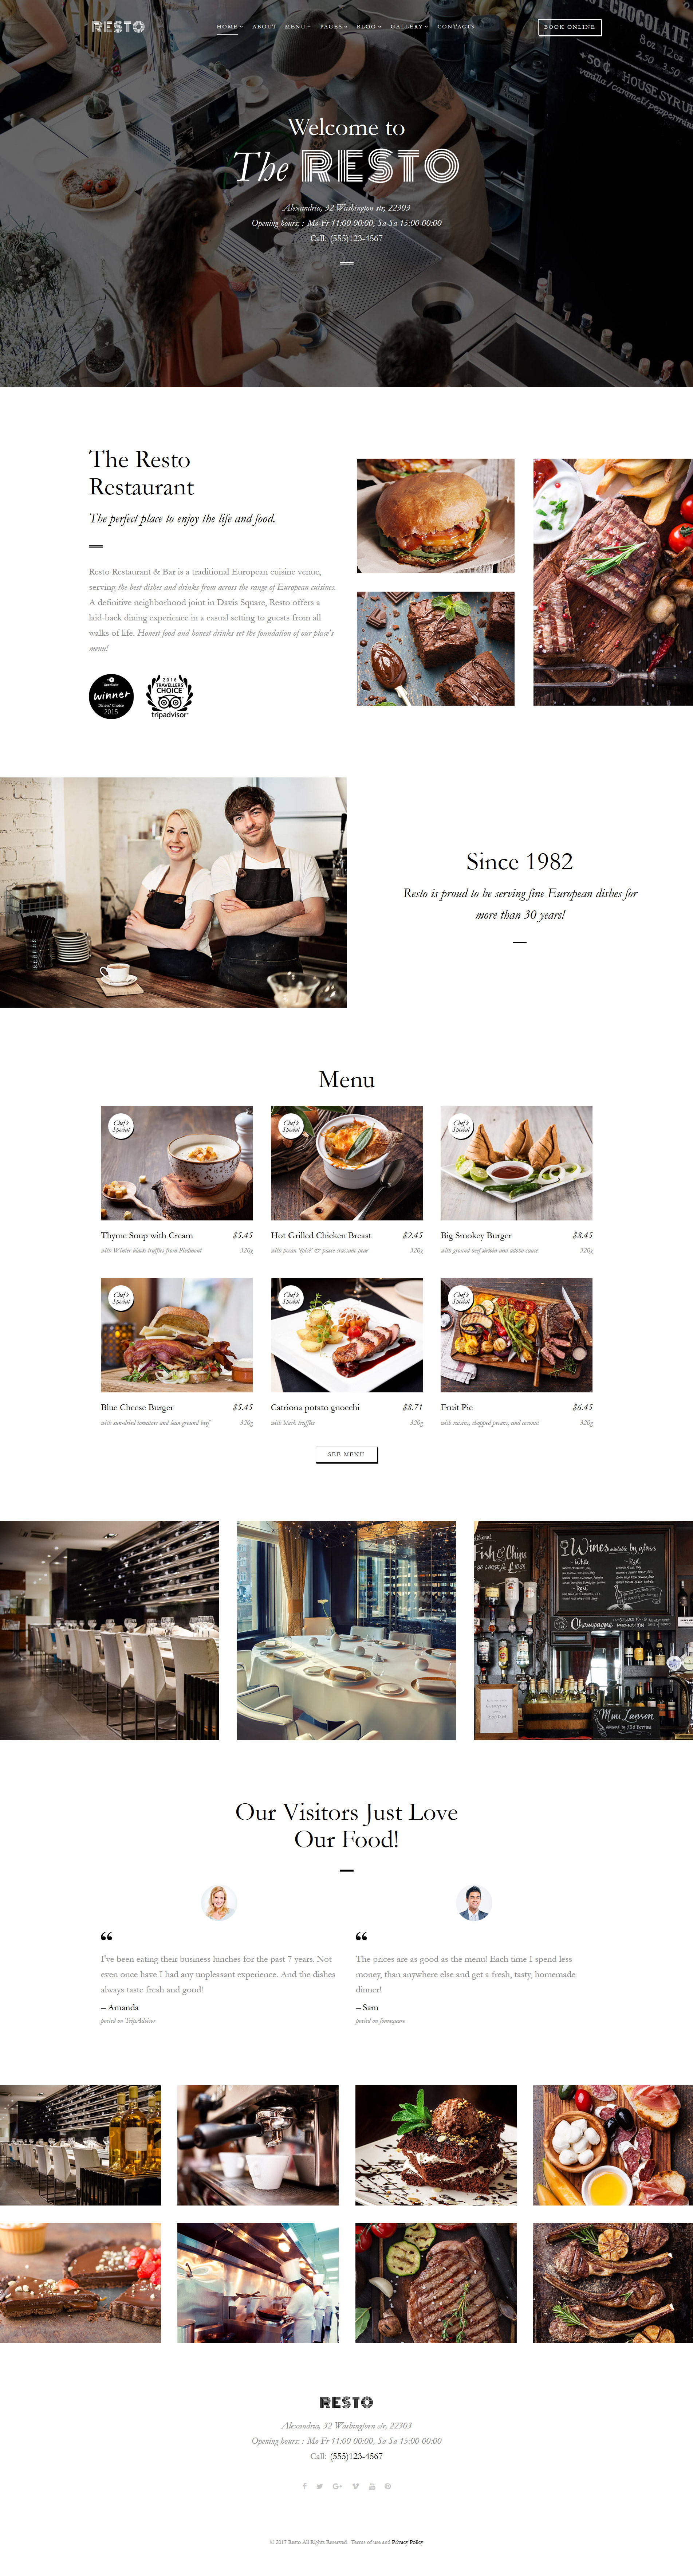 """Resto - Cafe & Restaurant Multipage"" - адаптивний Шаблон сайту №62276 - скріншот"